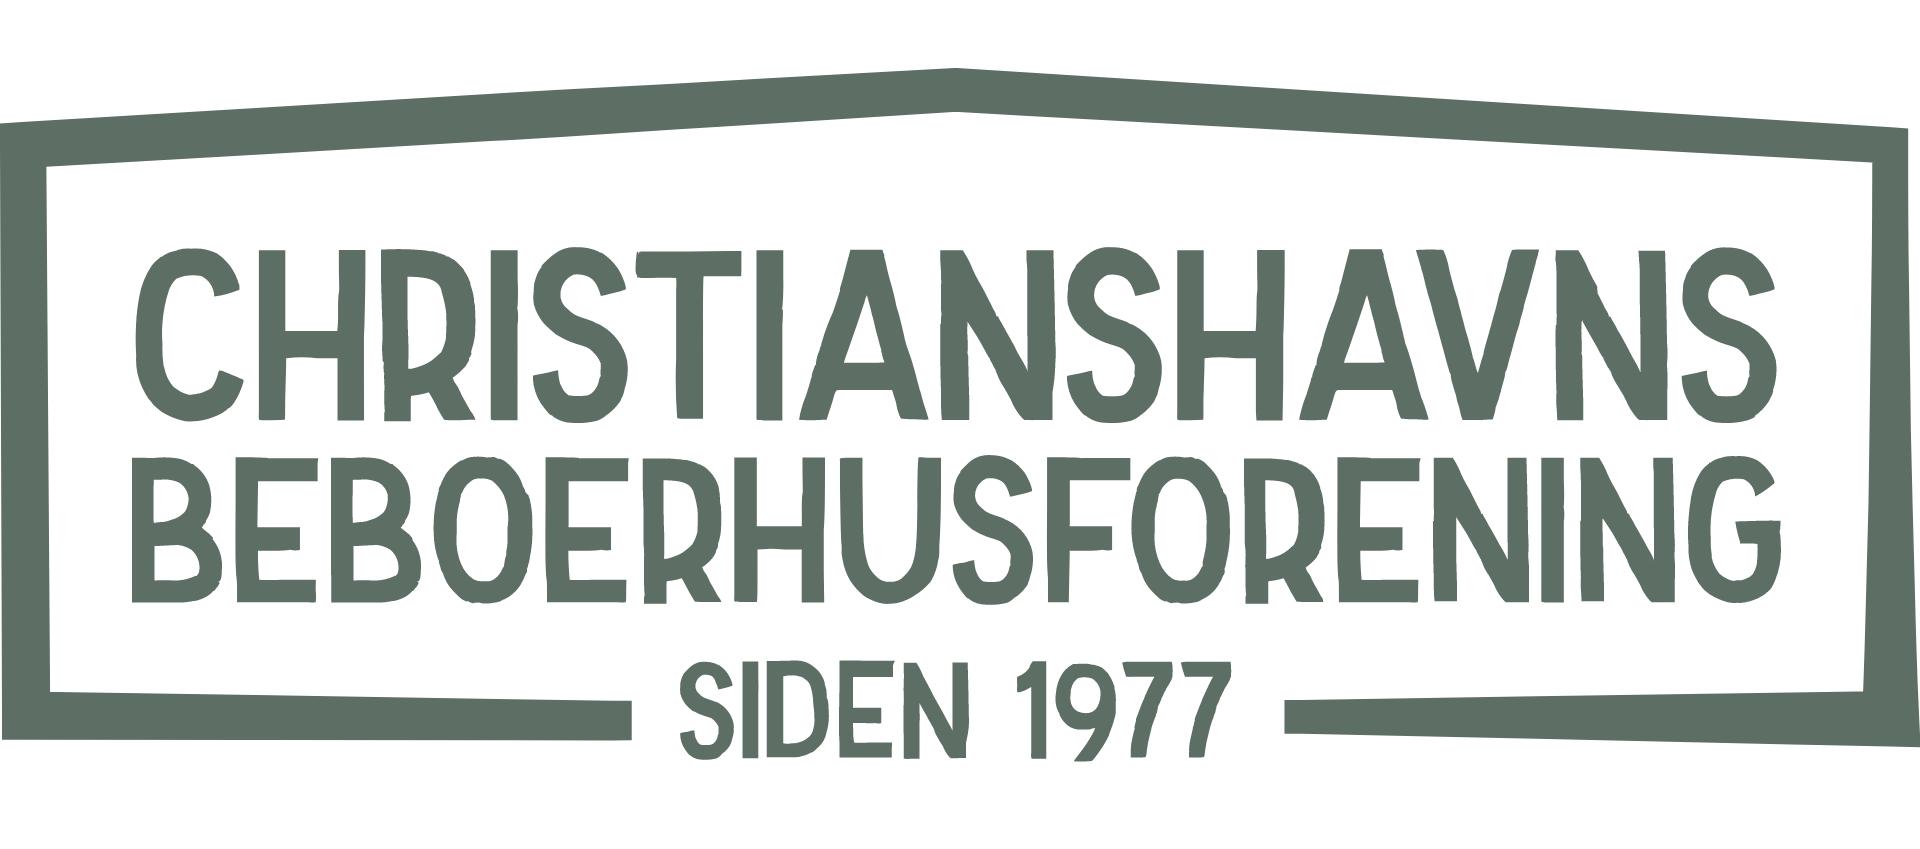 Ordinær Generalforsamling i Christianshavns Beboerhusforening